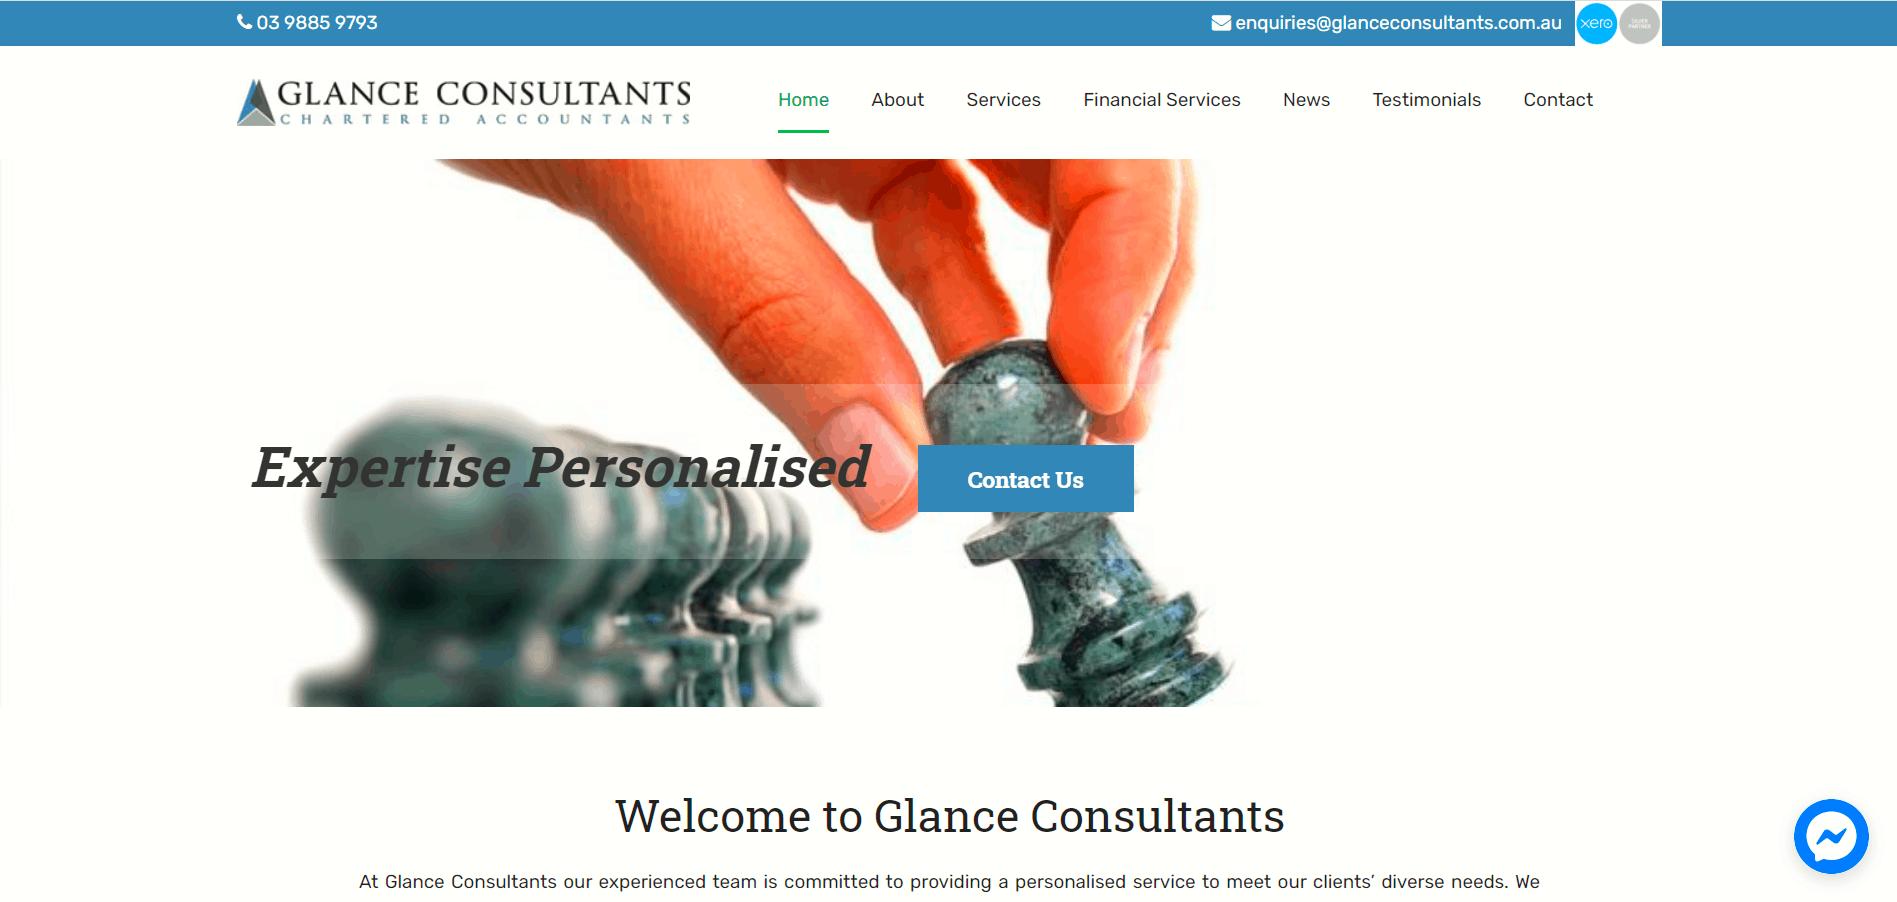 Glance Consultants